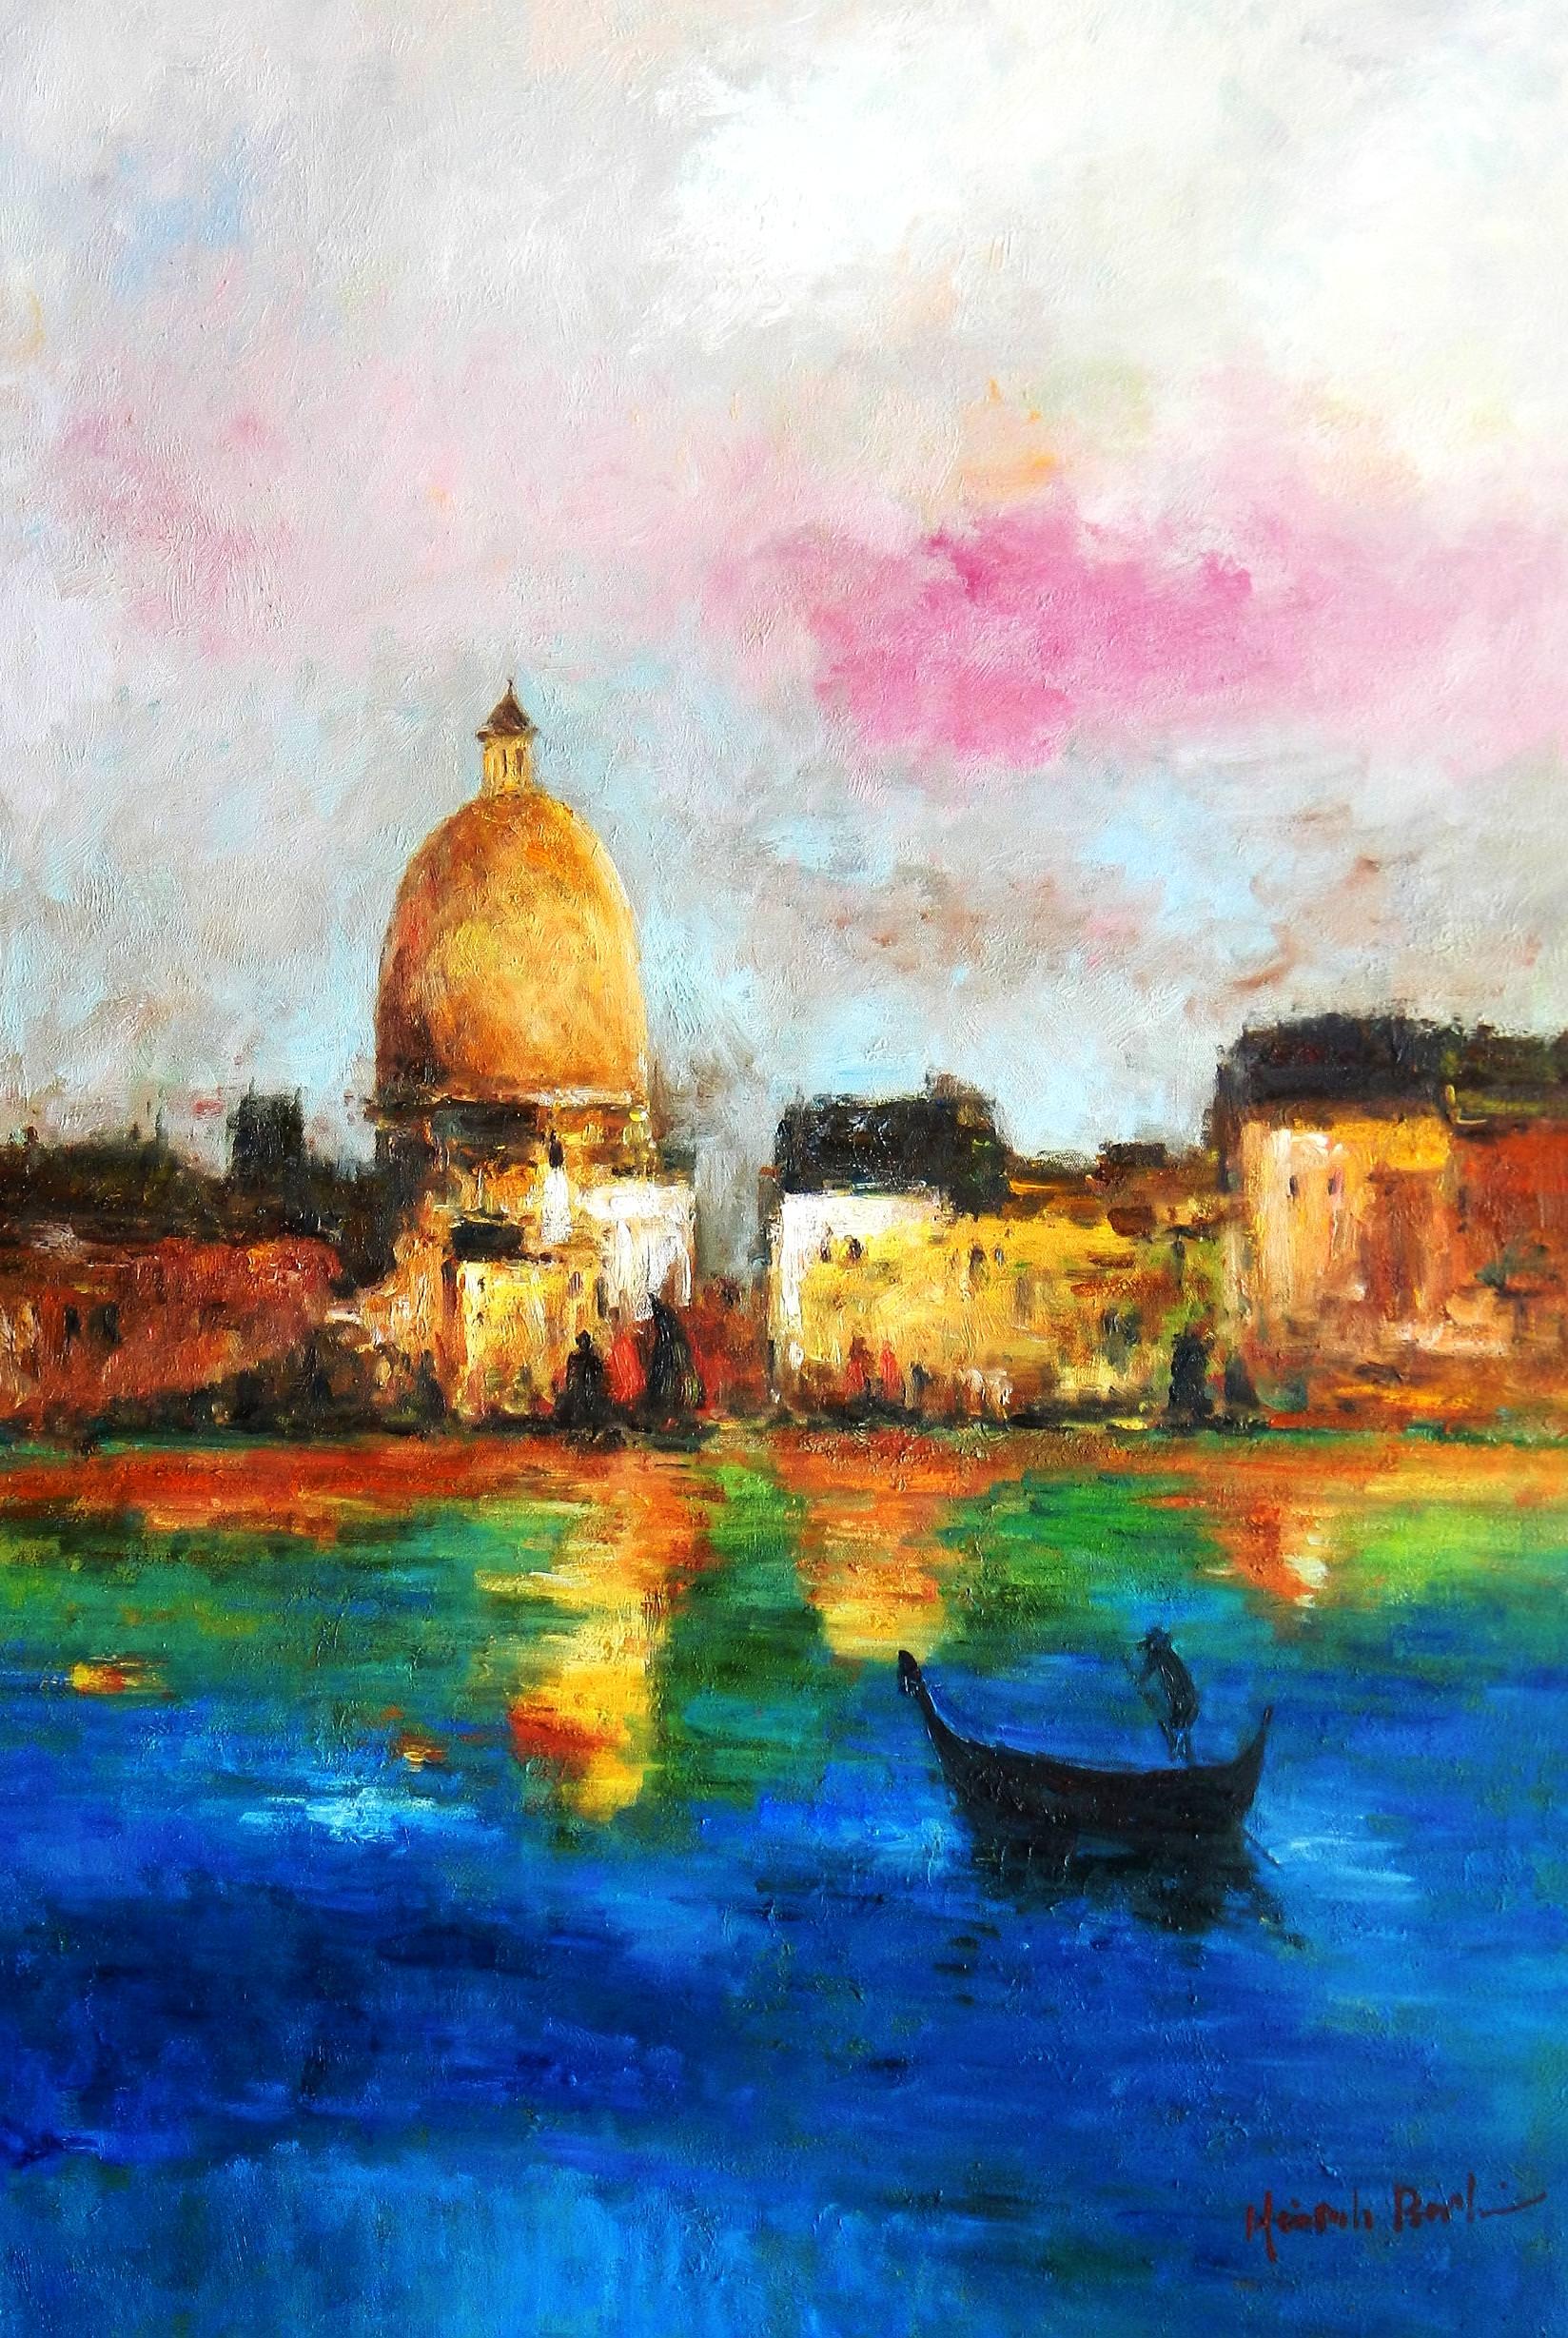 Modern Art - Venedig Canale Grande d92898 60x90cm handgemaltes Gemälde